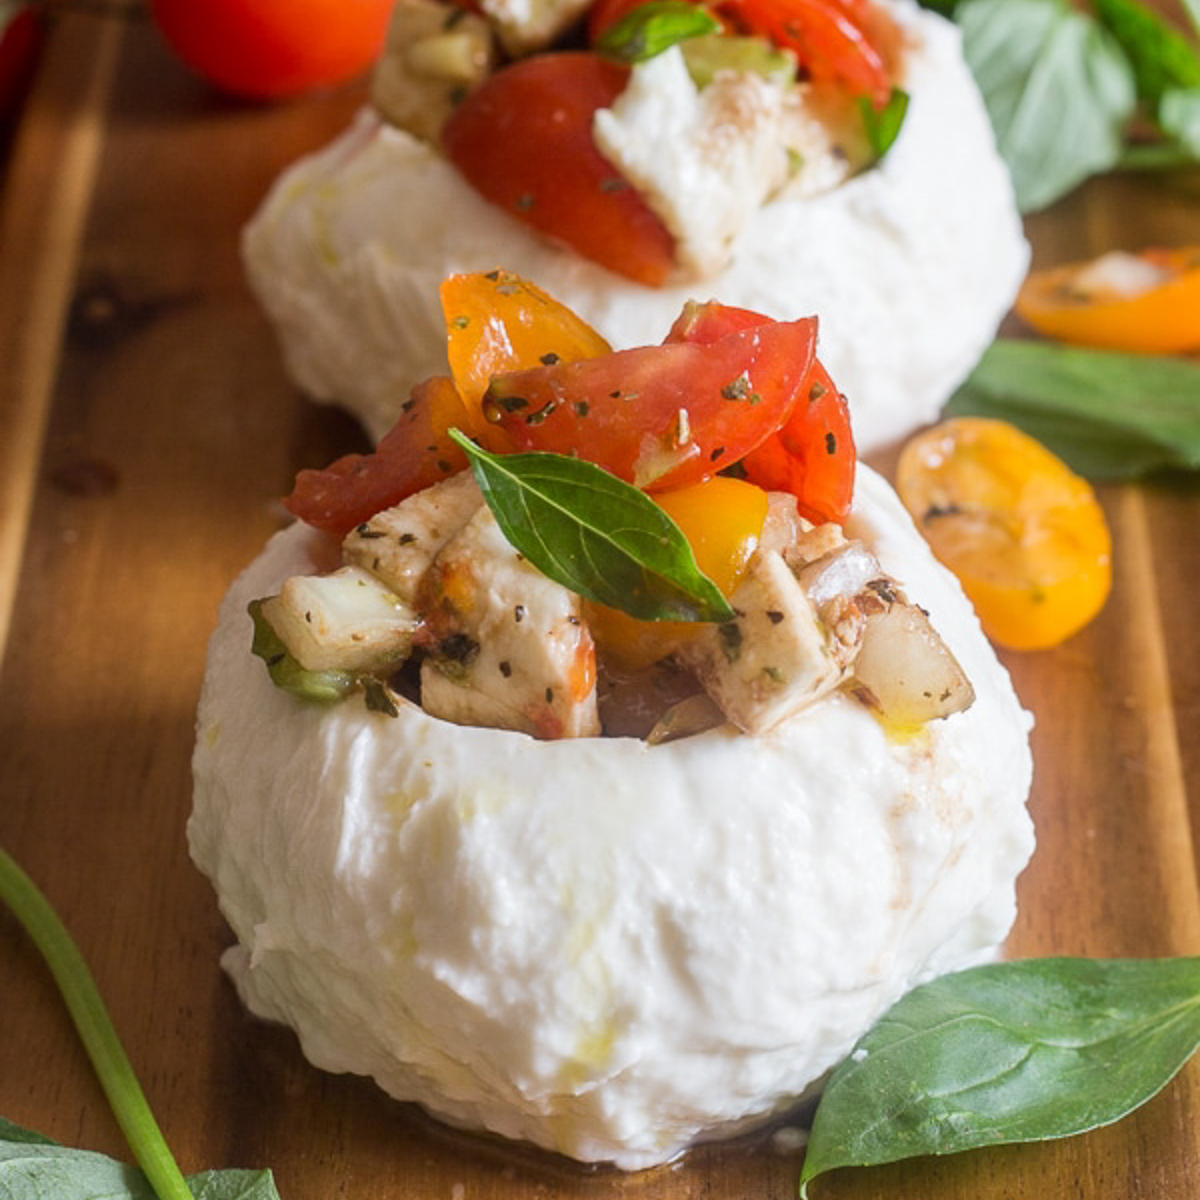 2 mozzarella stuffed with tomatoes & herbs.